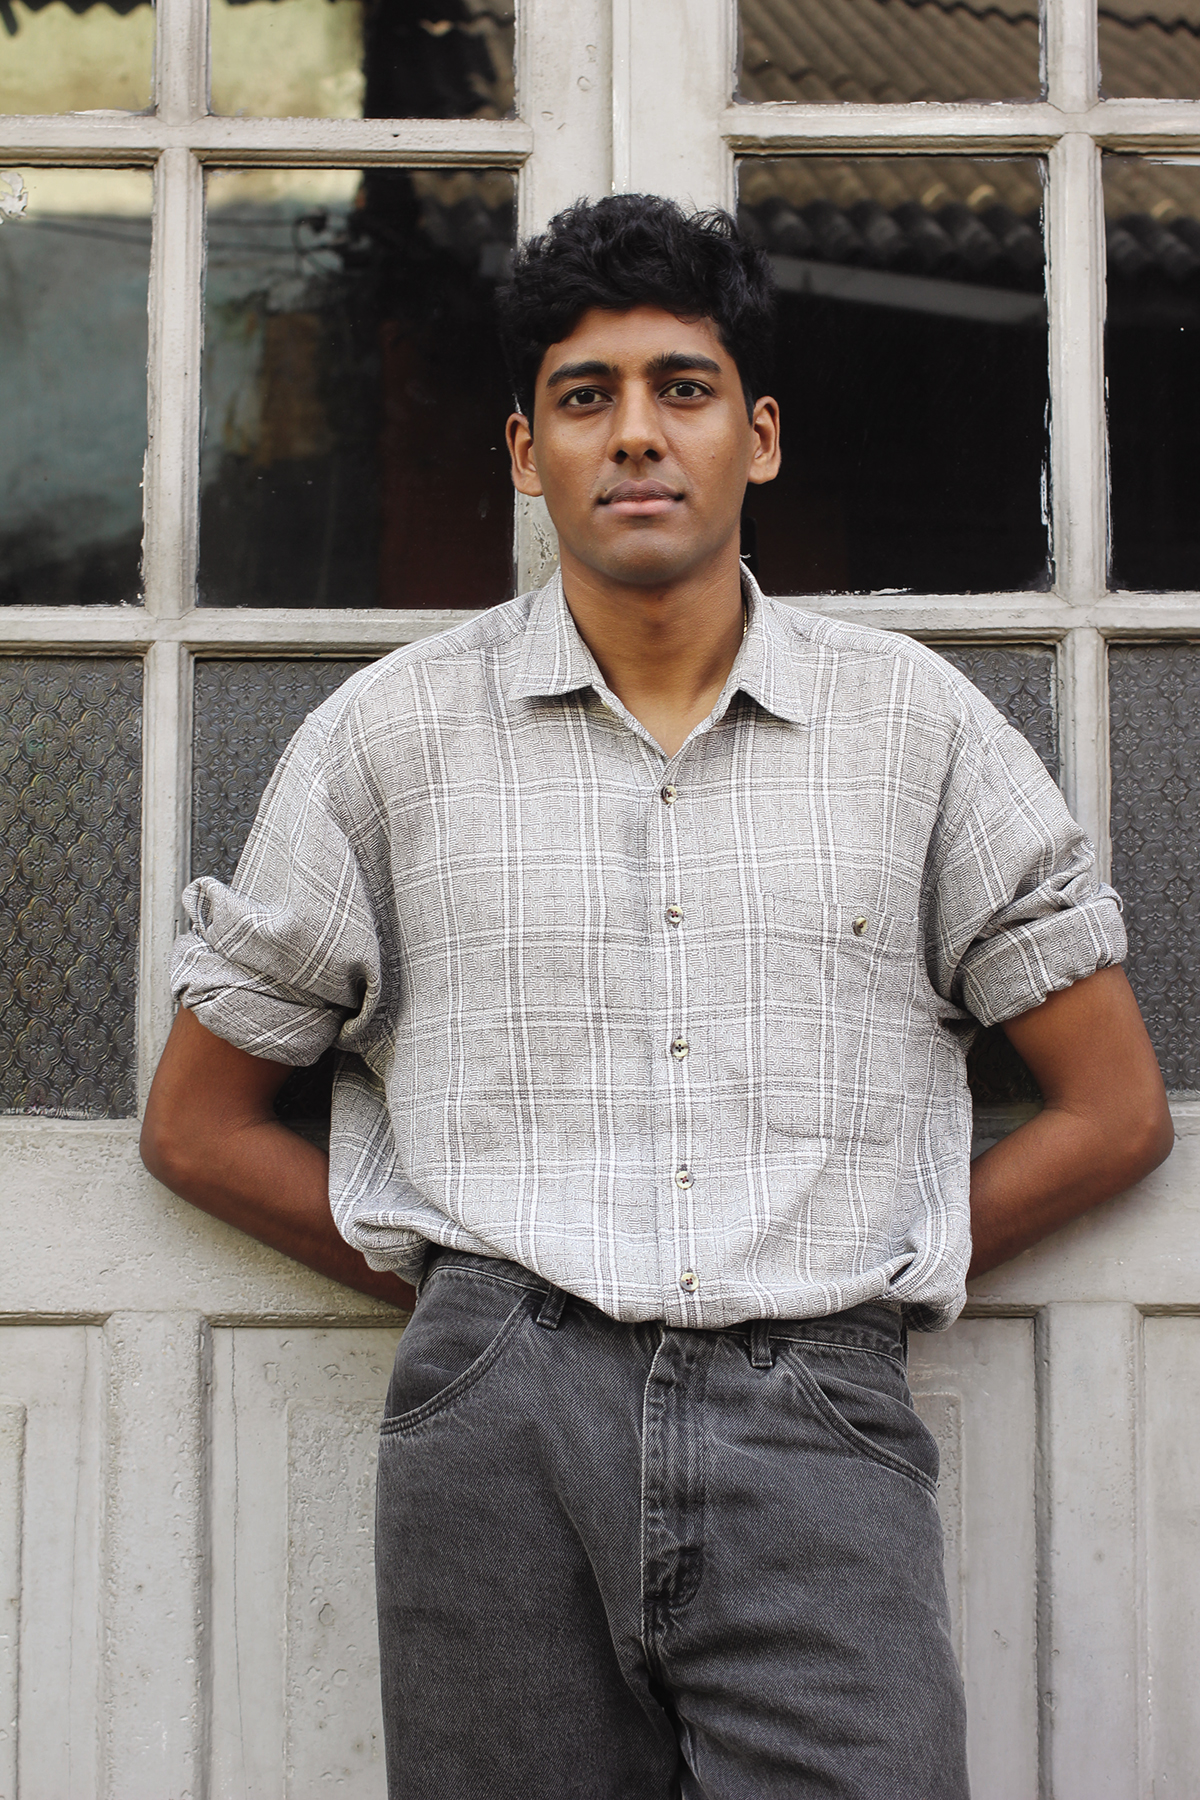 Anuk Arudpragasam: Contours of inner life